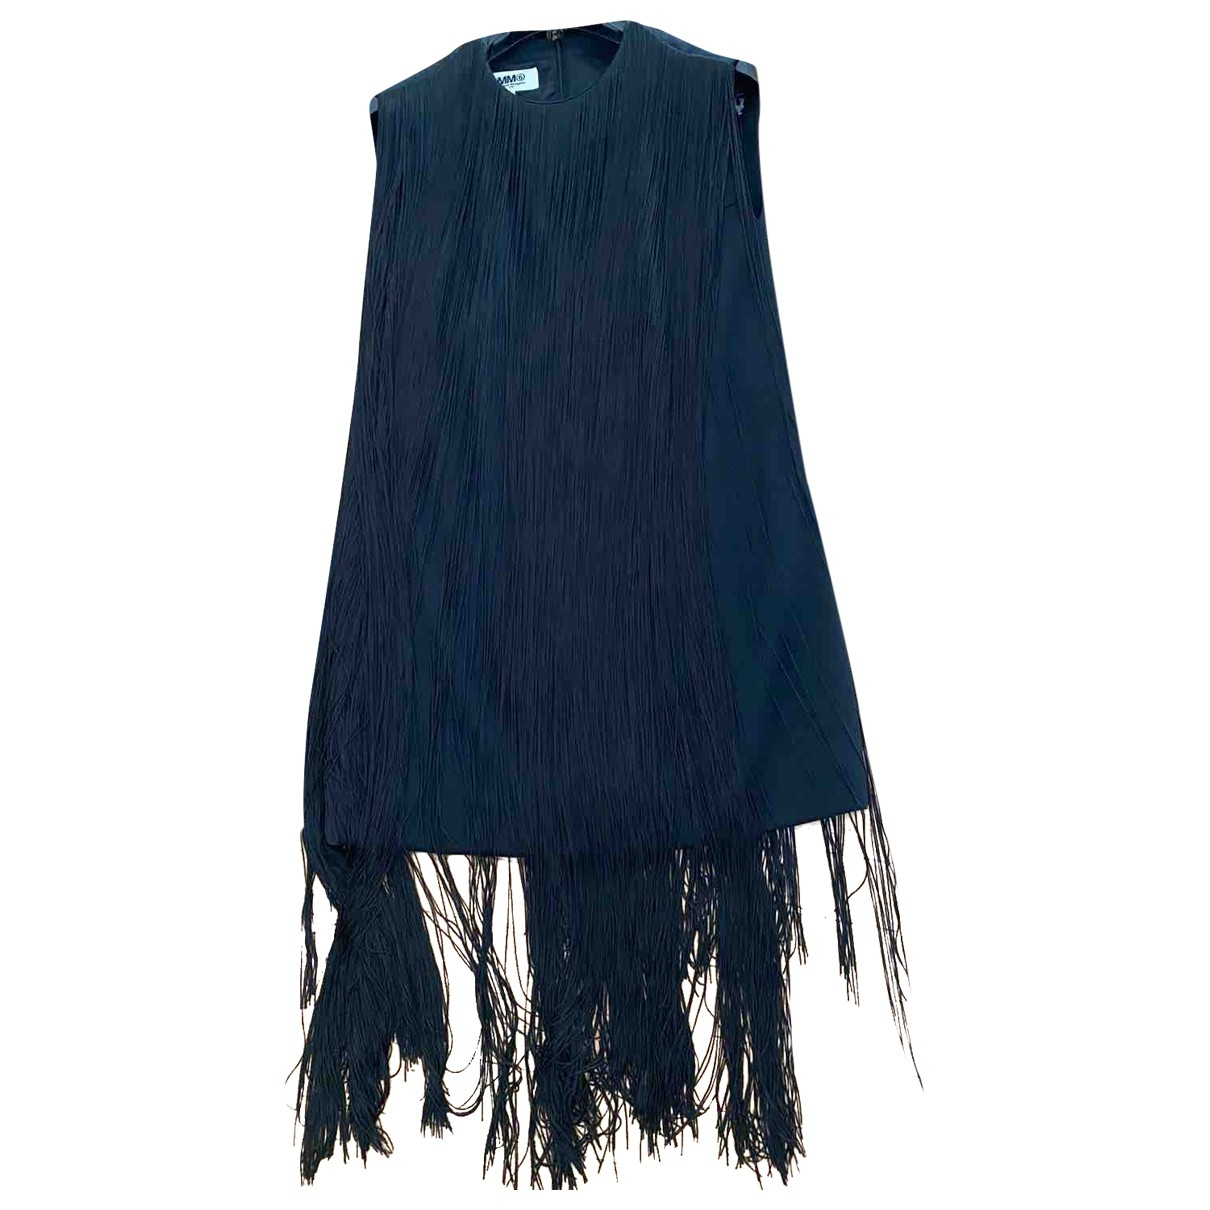 Mm6 \N Black Wool dress for Women 38 FR